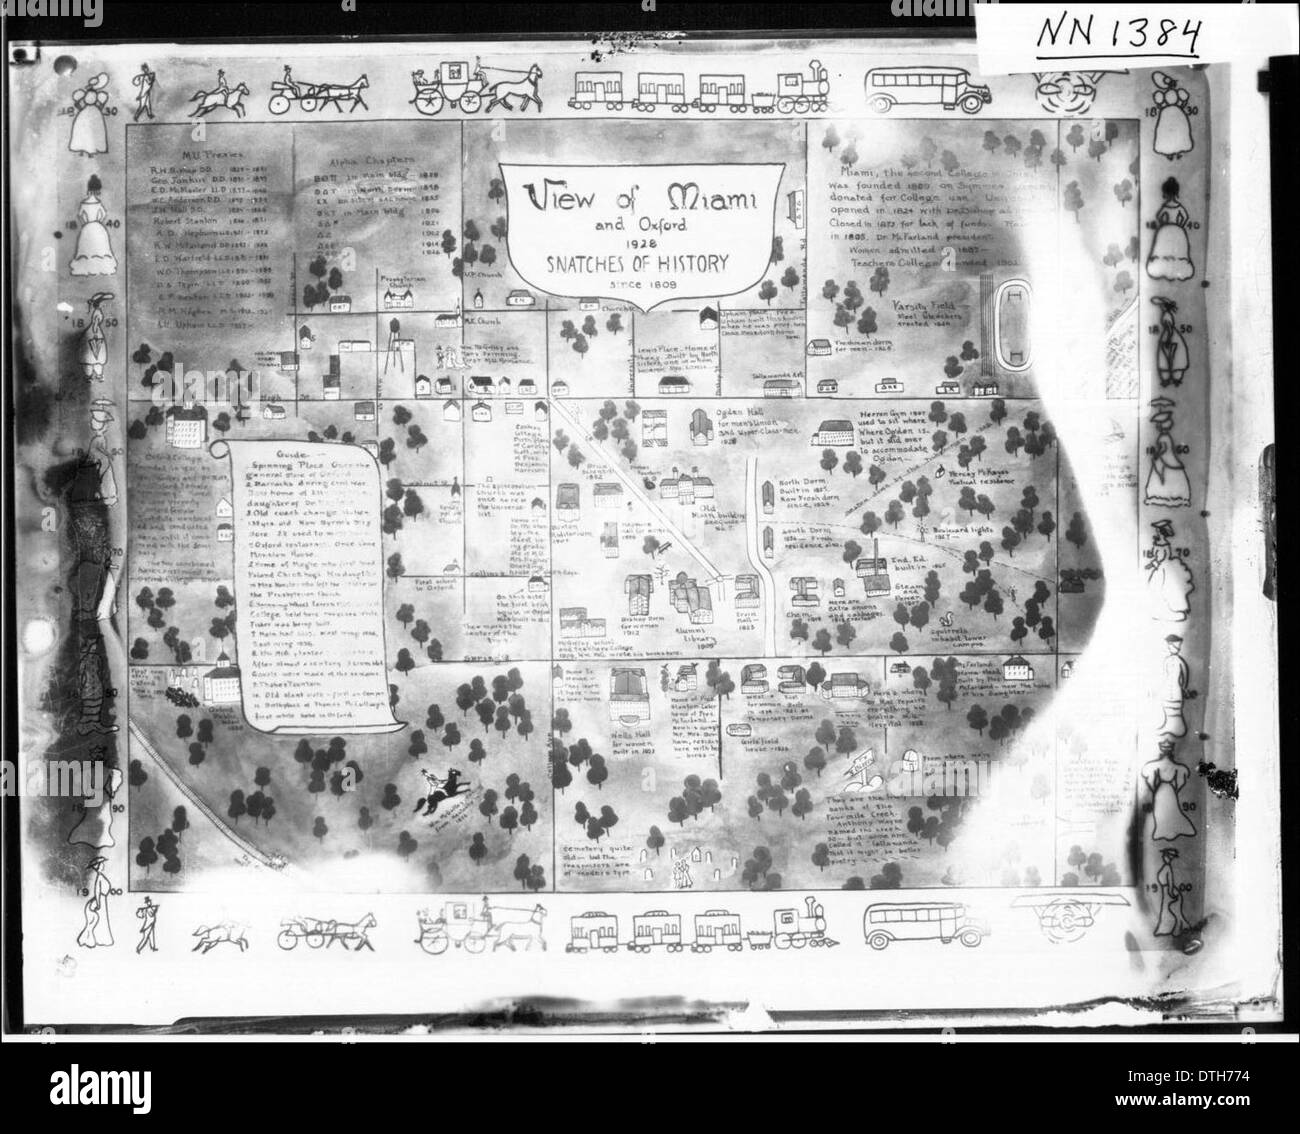 Illustrated Map Of Miami University Campus And Oxford Ohio Ca 1928